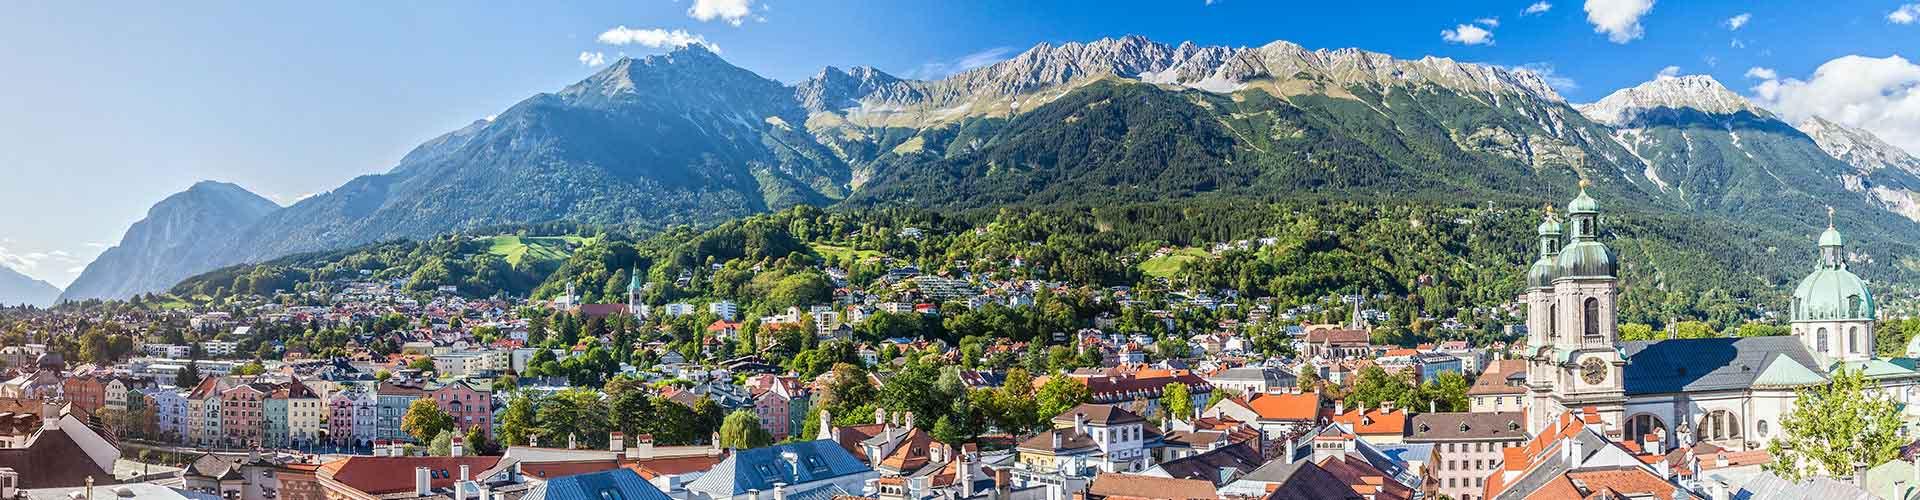 Innsbruck - Hoteles baratos en Innsbruck. Mapas de Innsbruck, Fotos y comentarios de cada Hotel en Innsbruck.